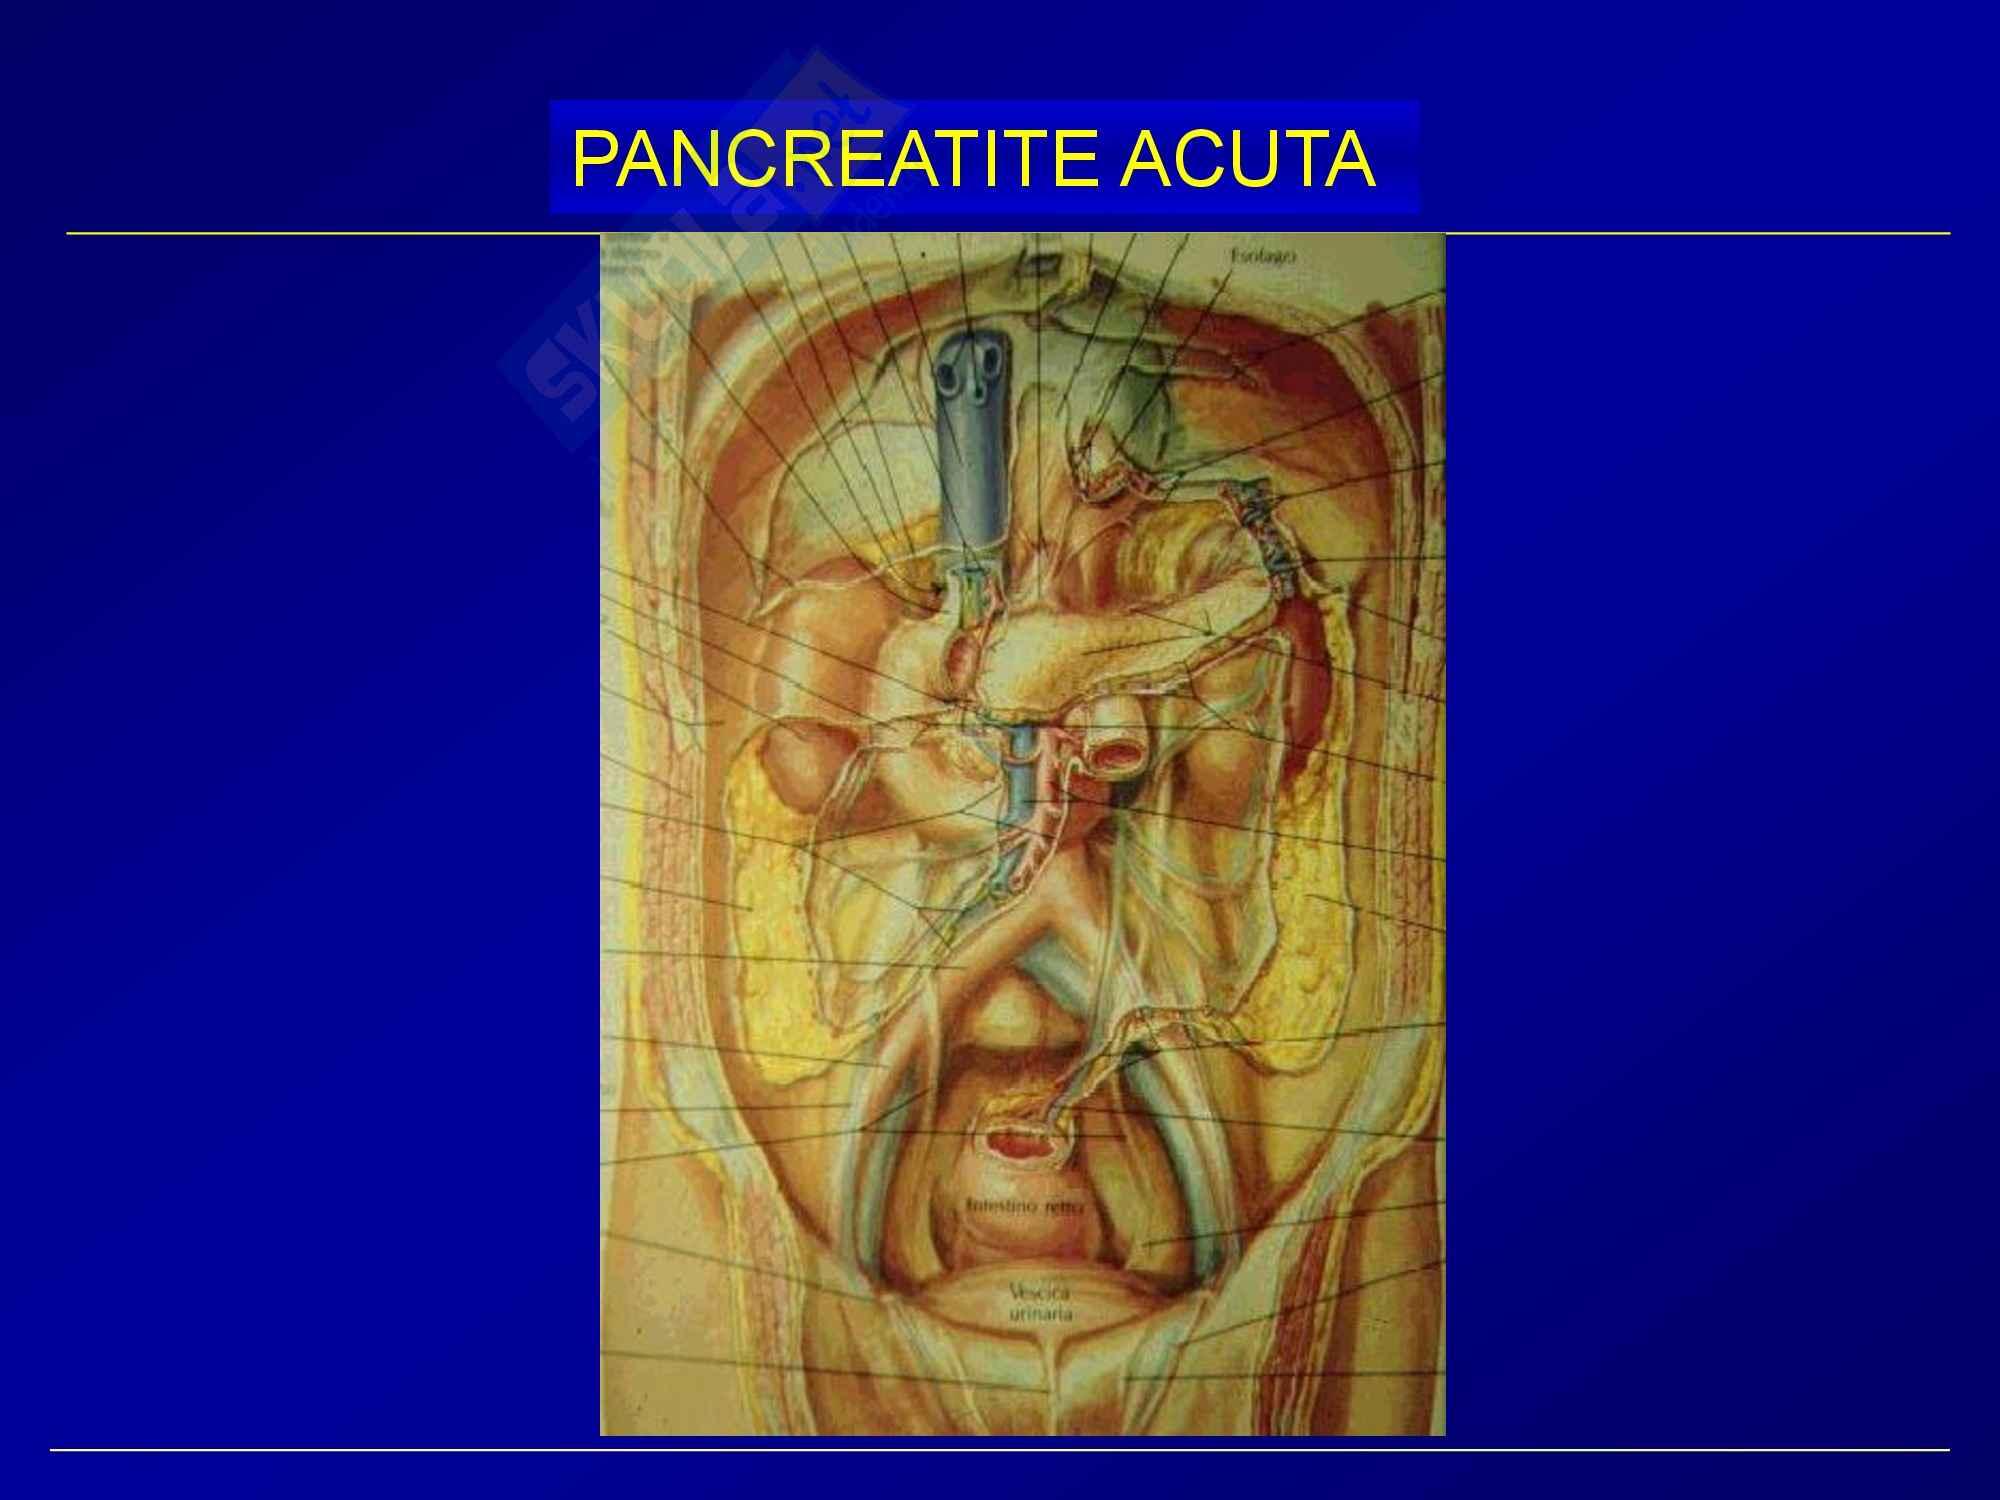 Chirurgia generale - pancreatite acuta